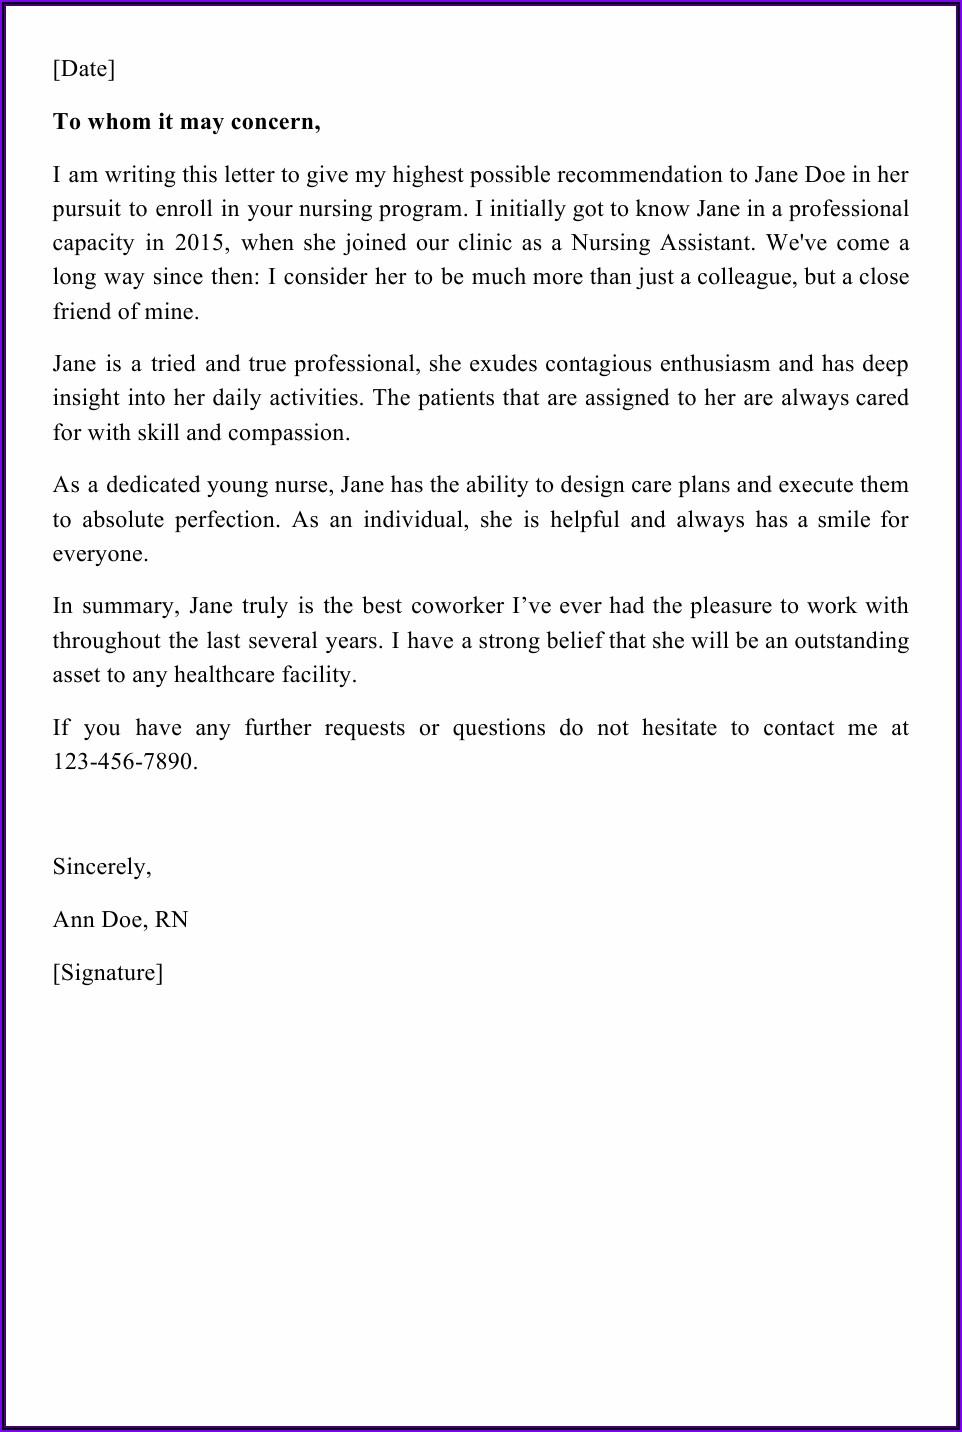 Letter Of Recommendation For Coworker For Nursing School